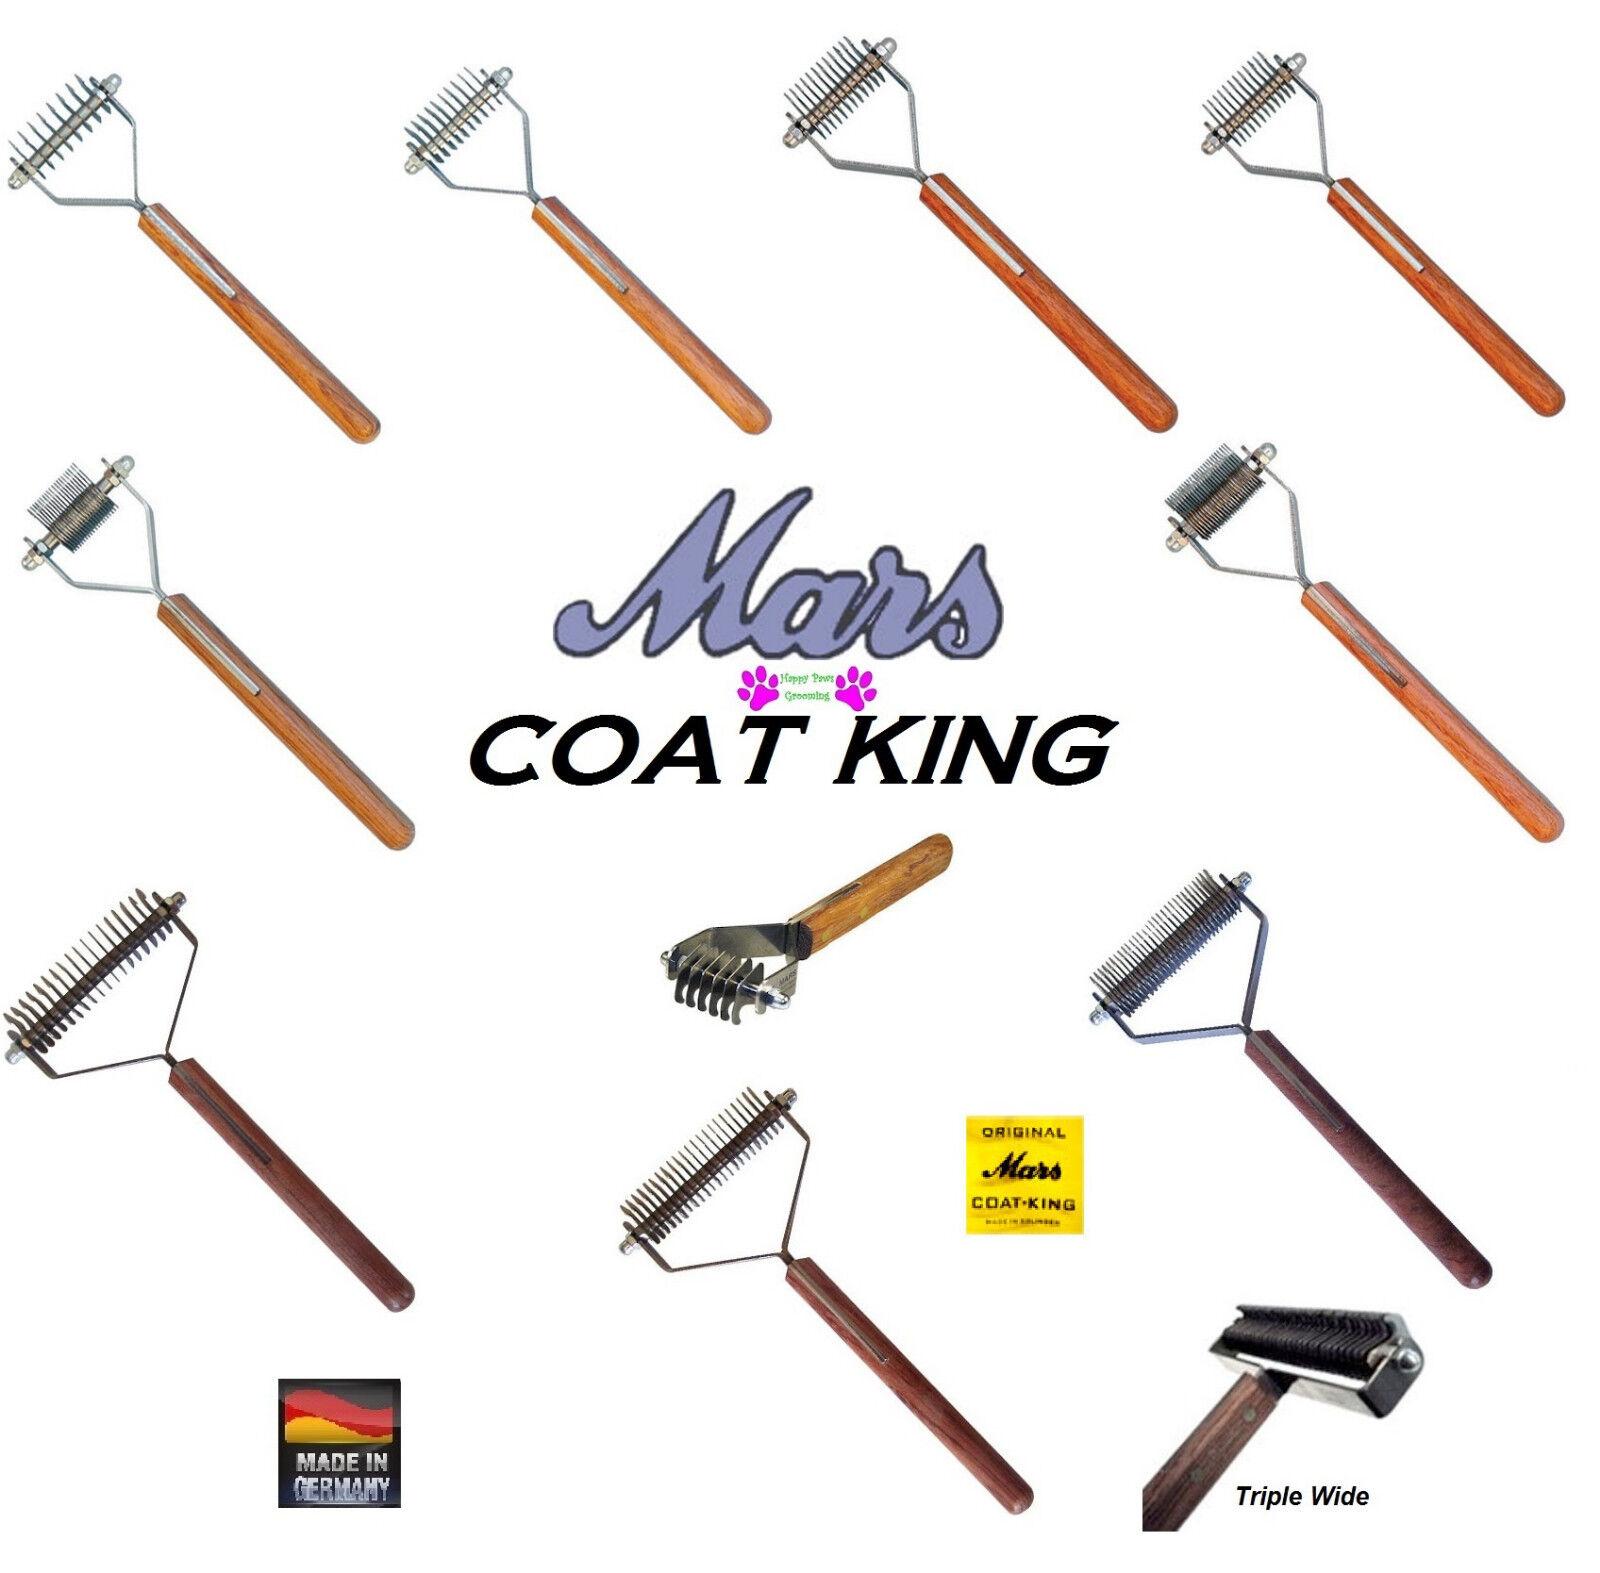 Mars coat king stripper